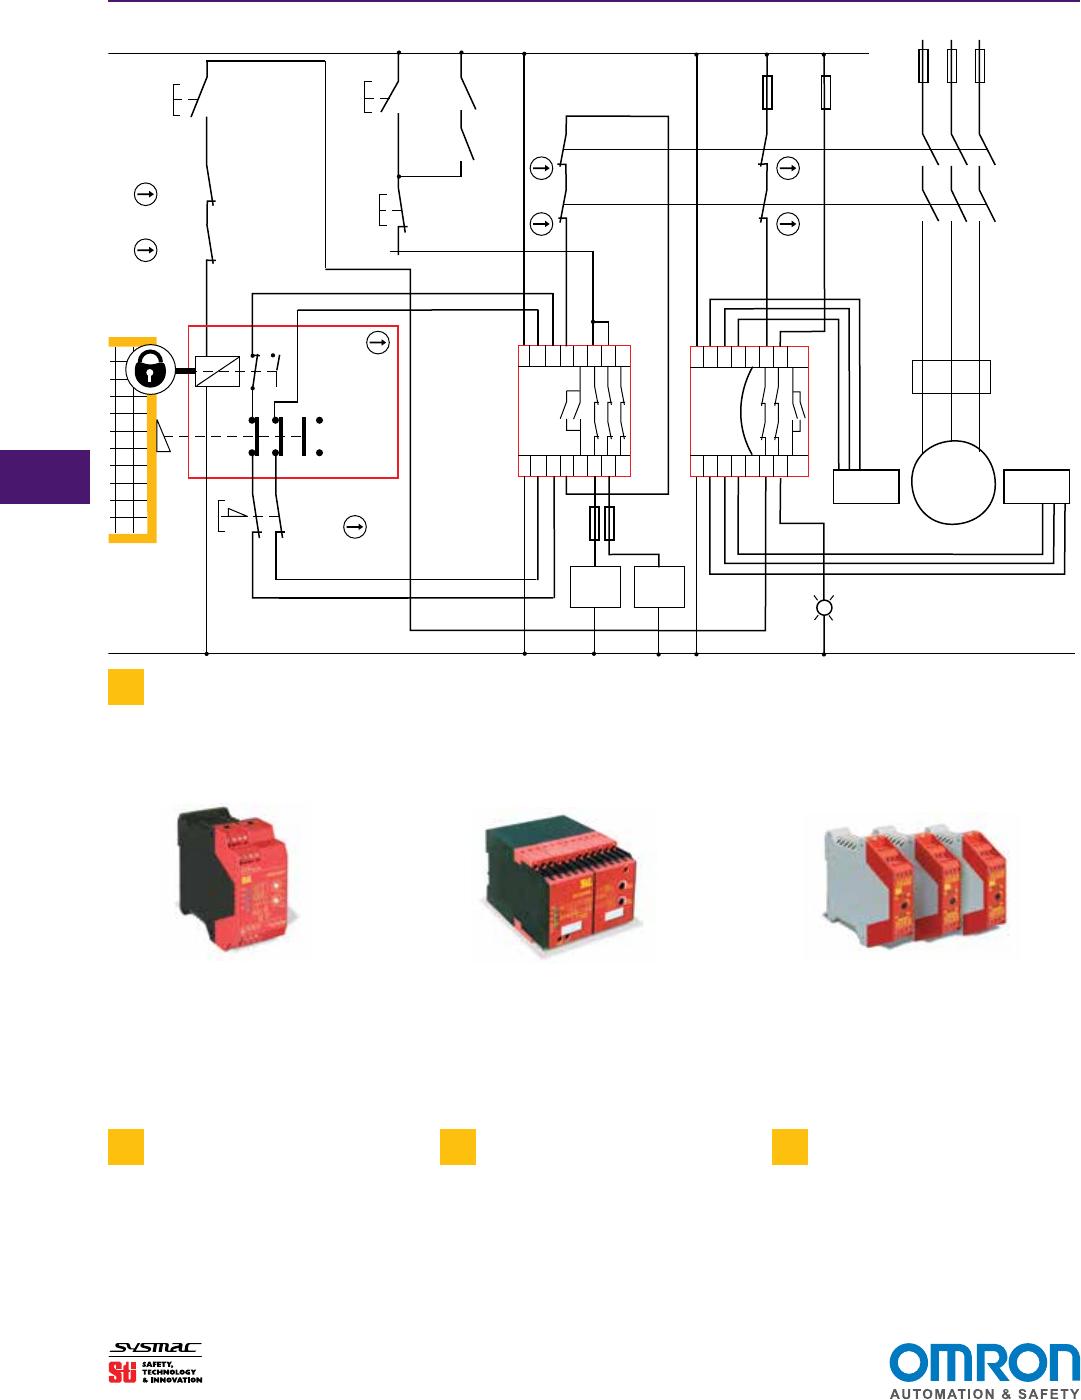 335 wiring diagram wiring diagram networks 2000 Polaris Sportsman 335 Polaris 335 Sportsman Parts